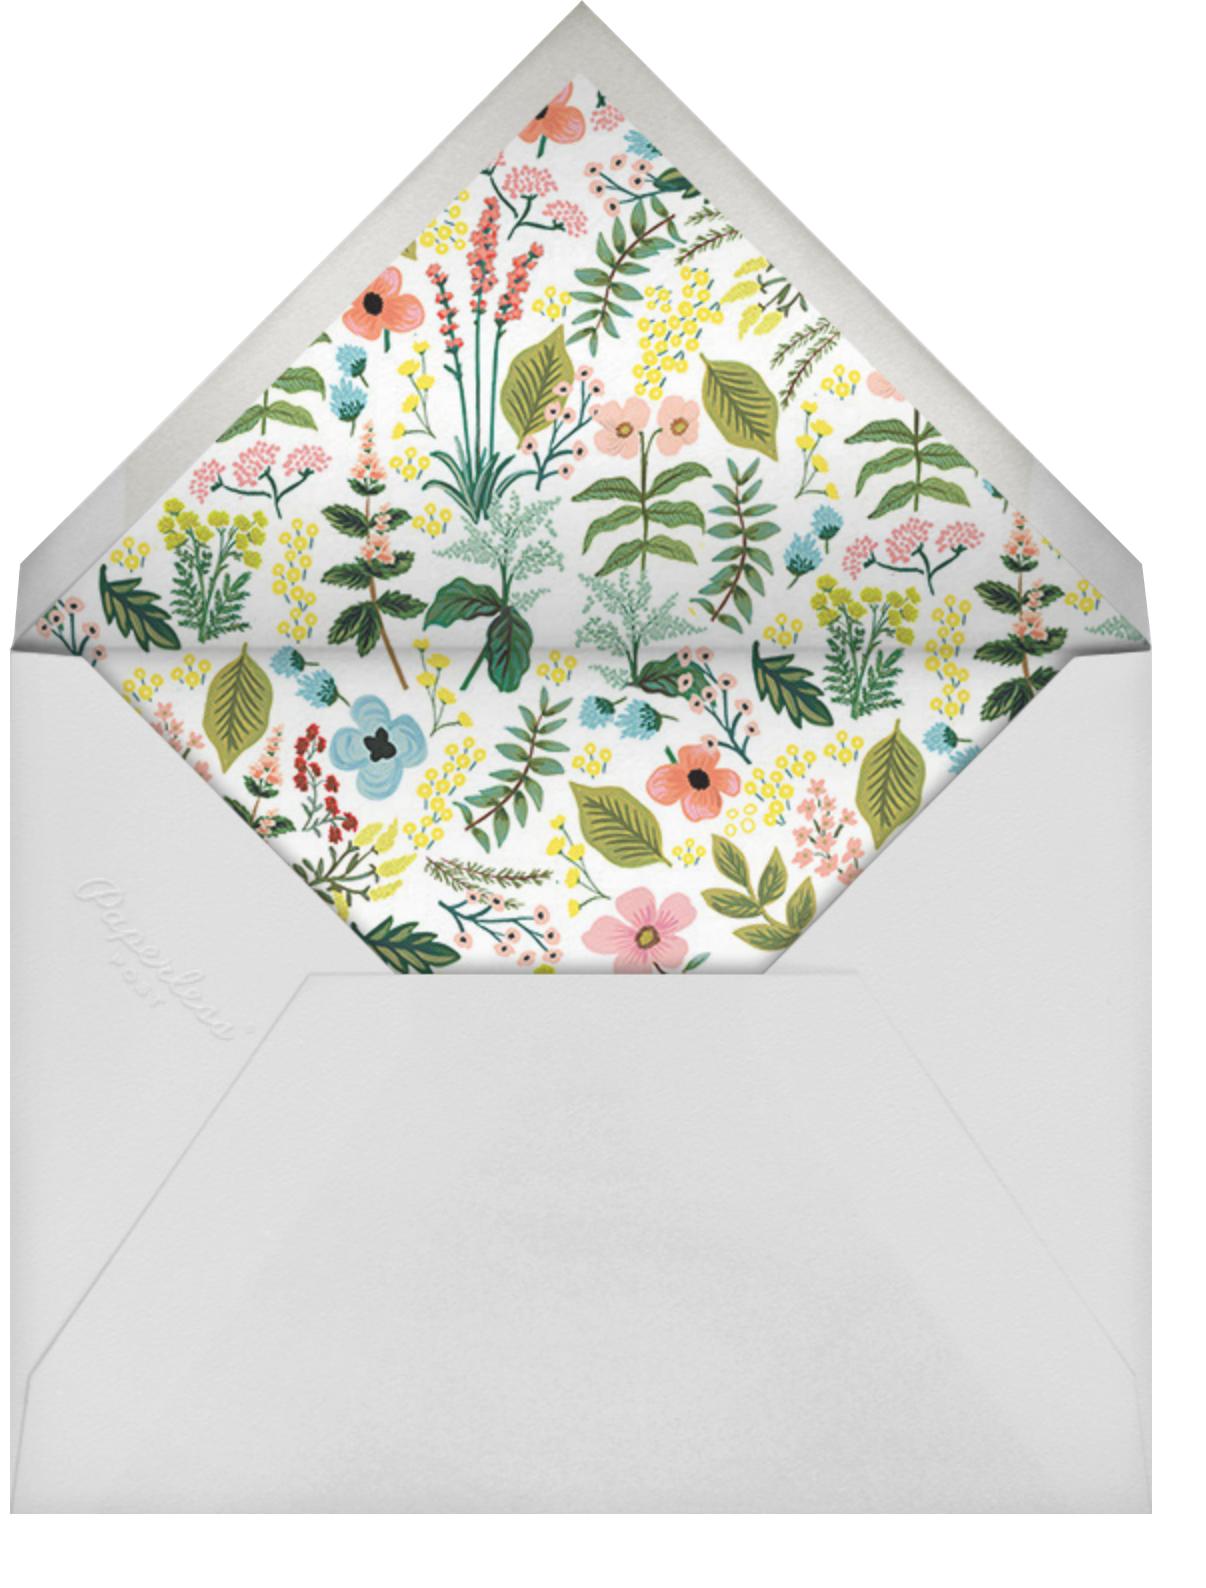 Spring Gathering - White - Rifle Paper Co. - Envelope